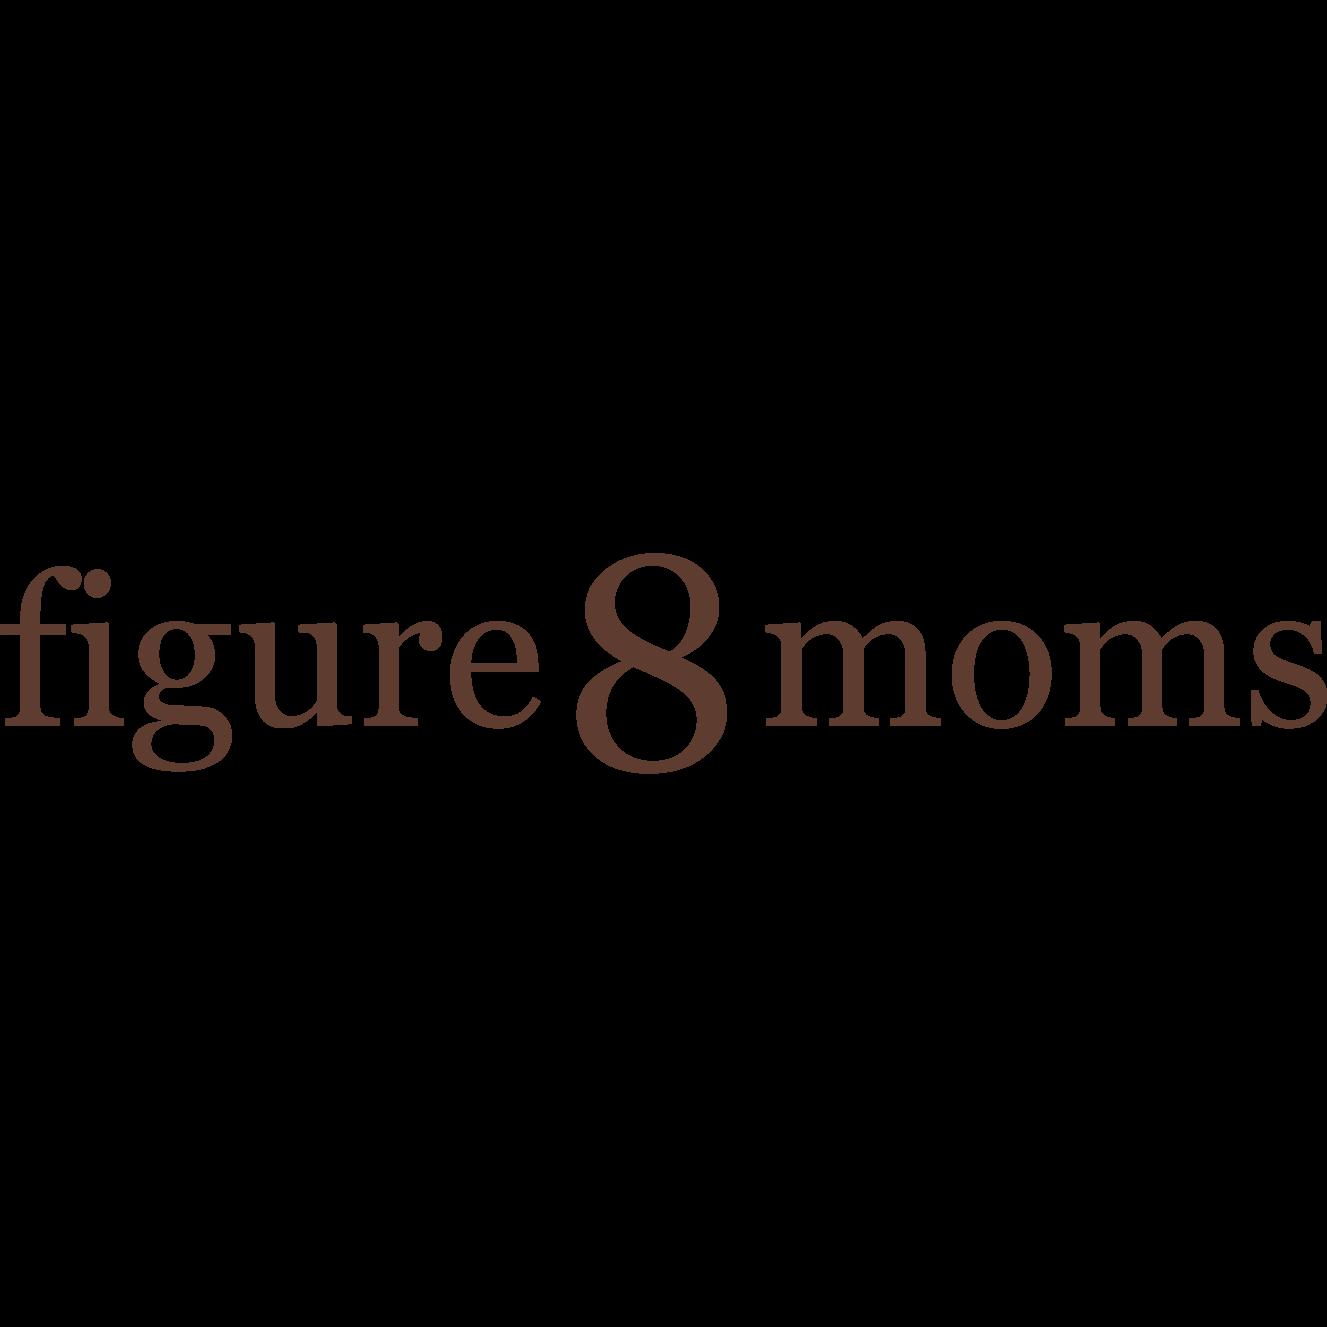 figure-8-moms-logo-brown.png